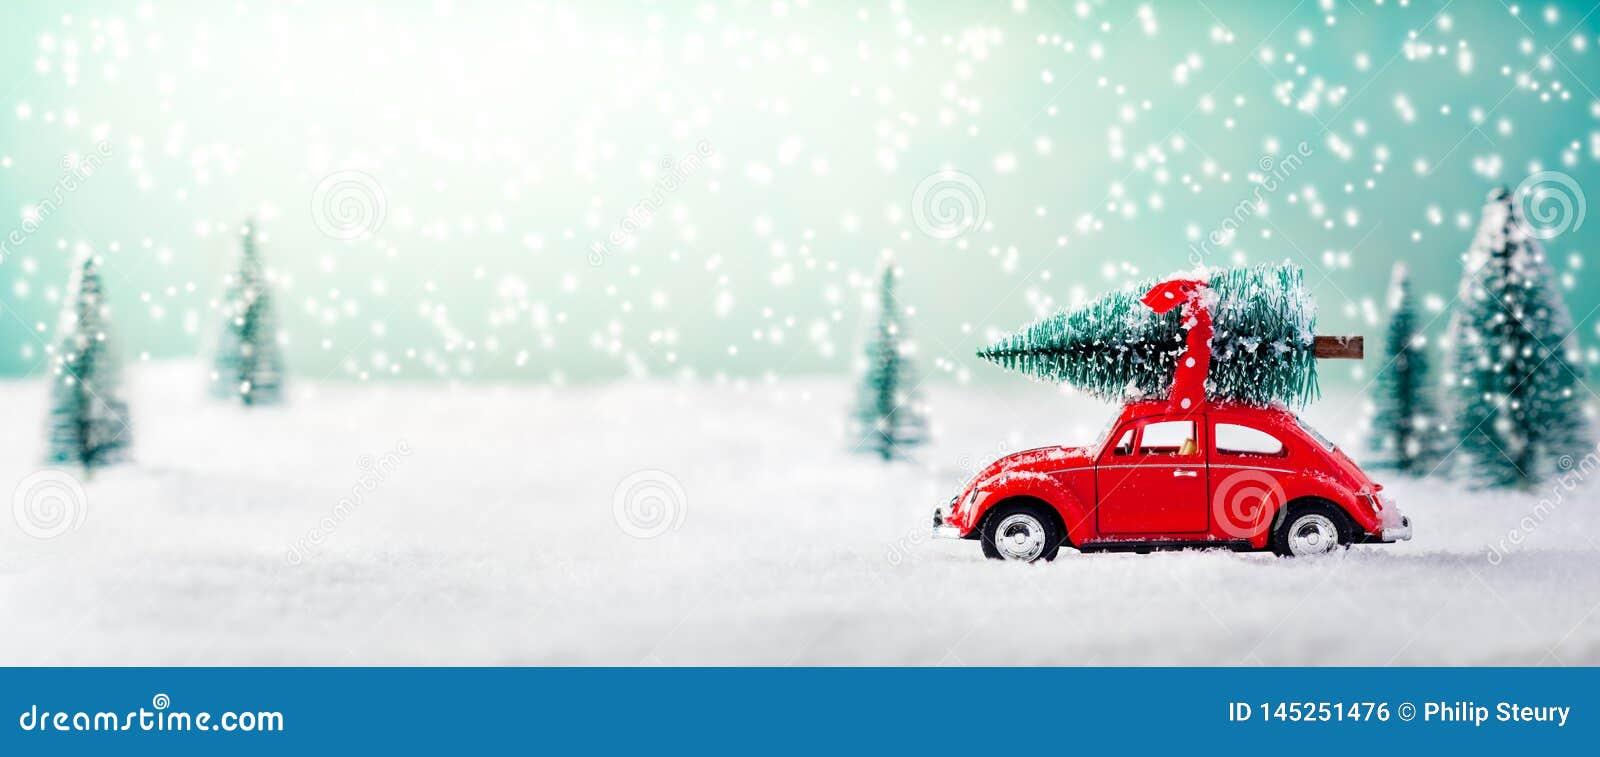 Auto Dragende Kerstboom